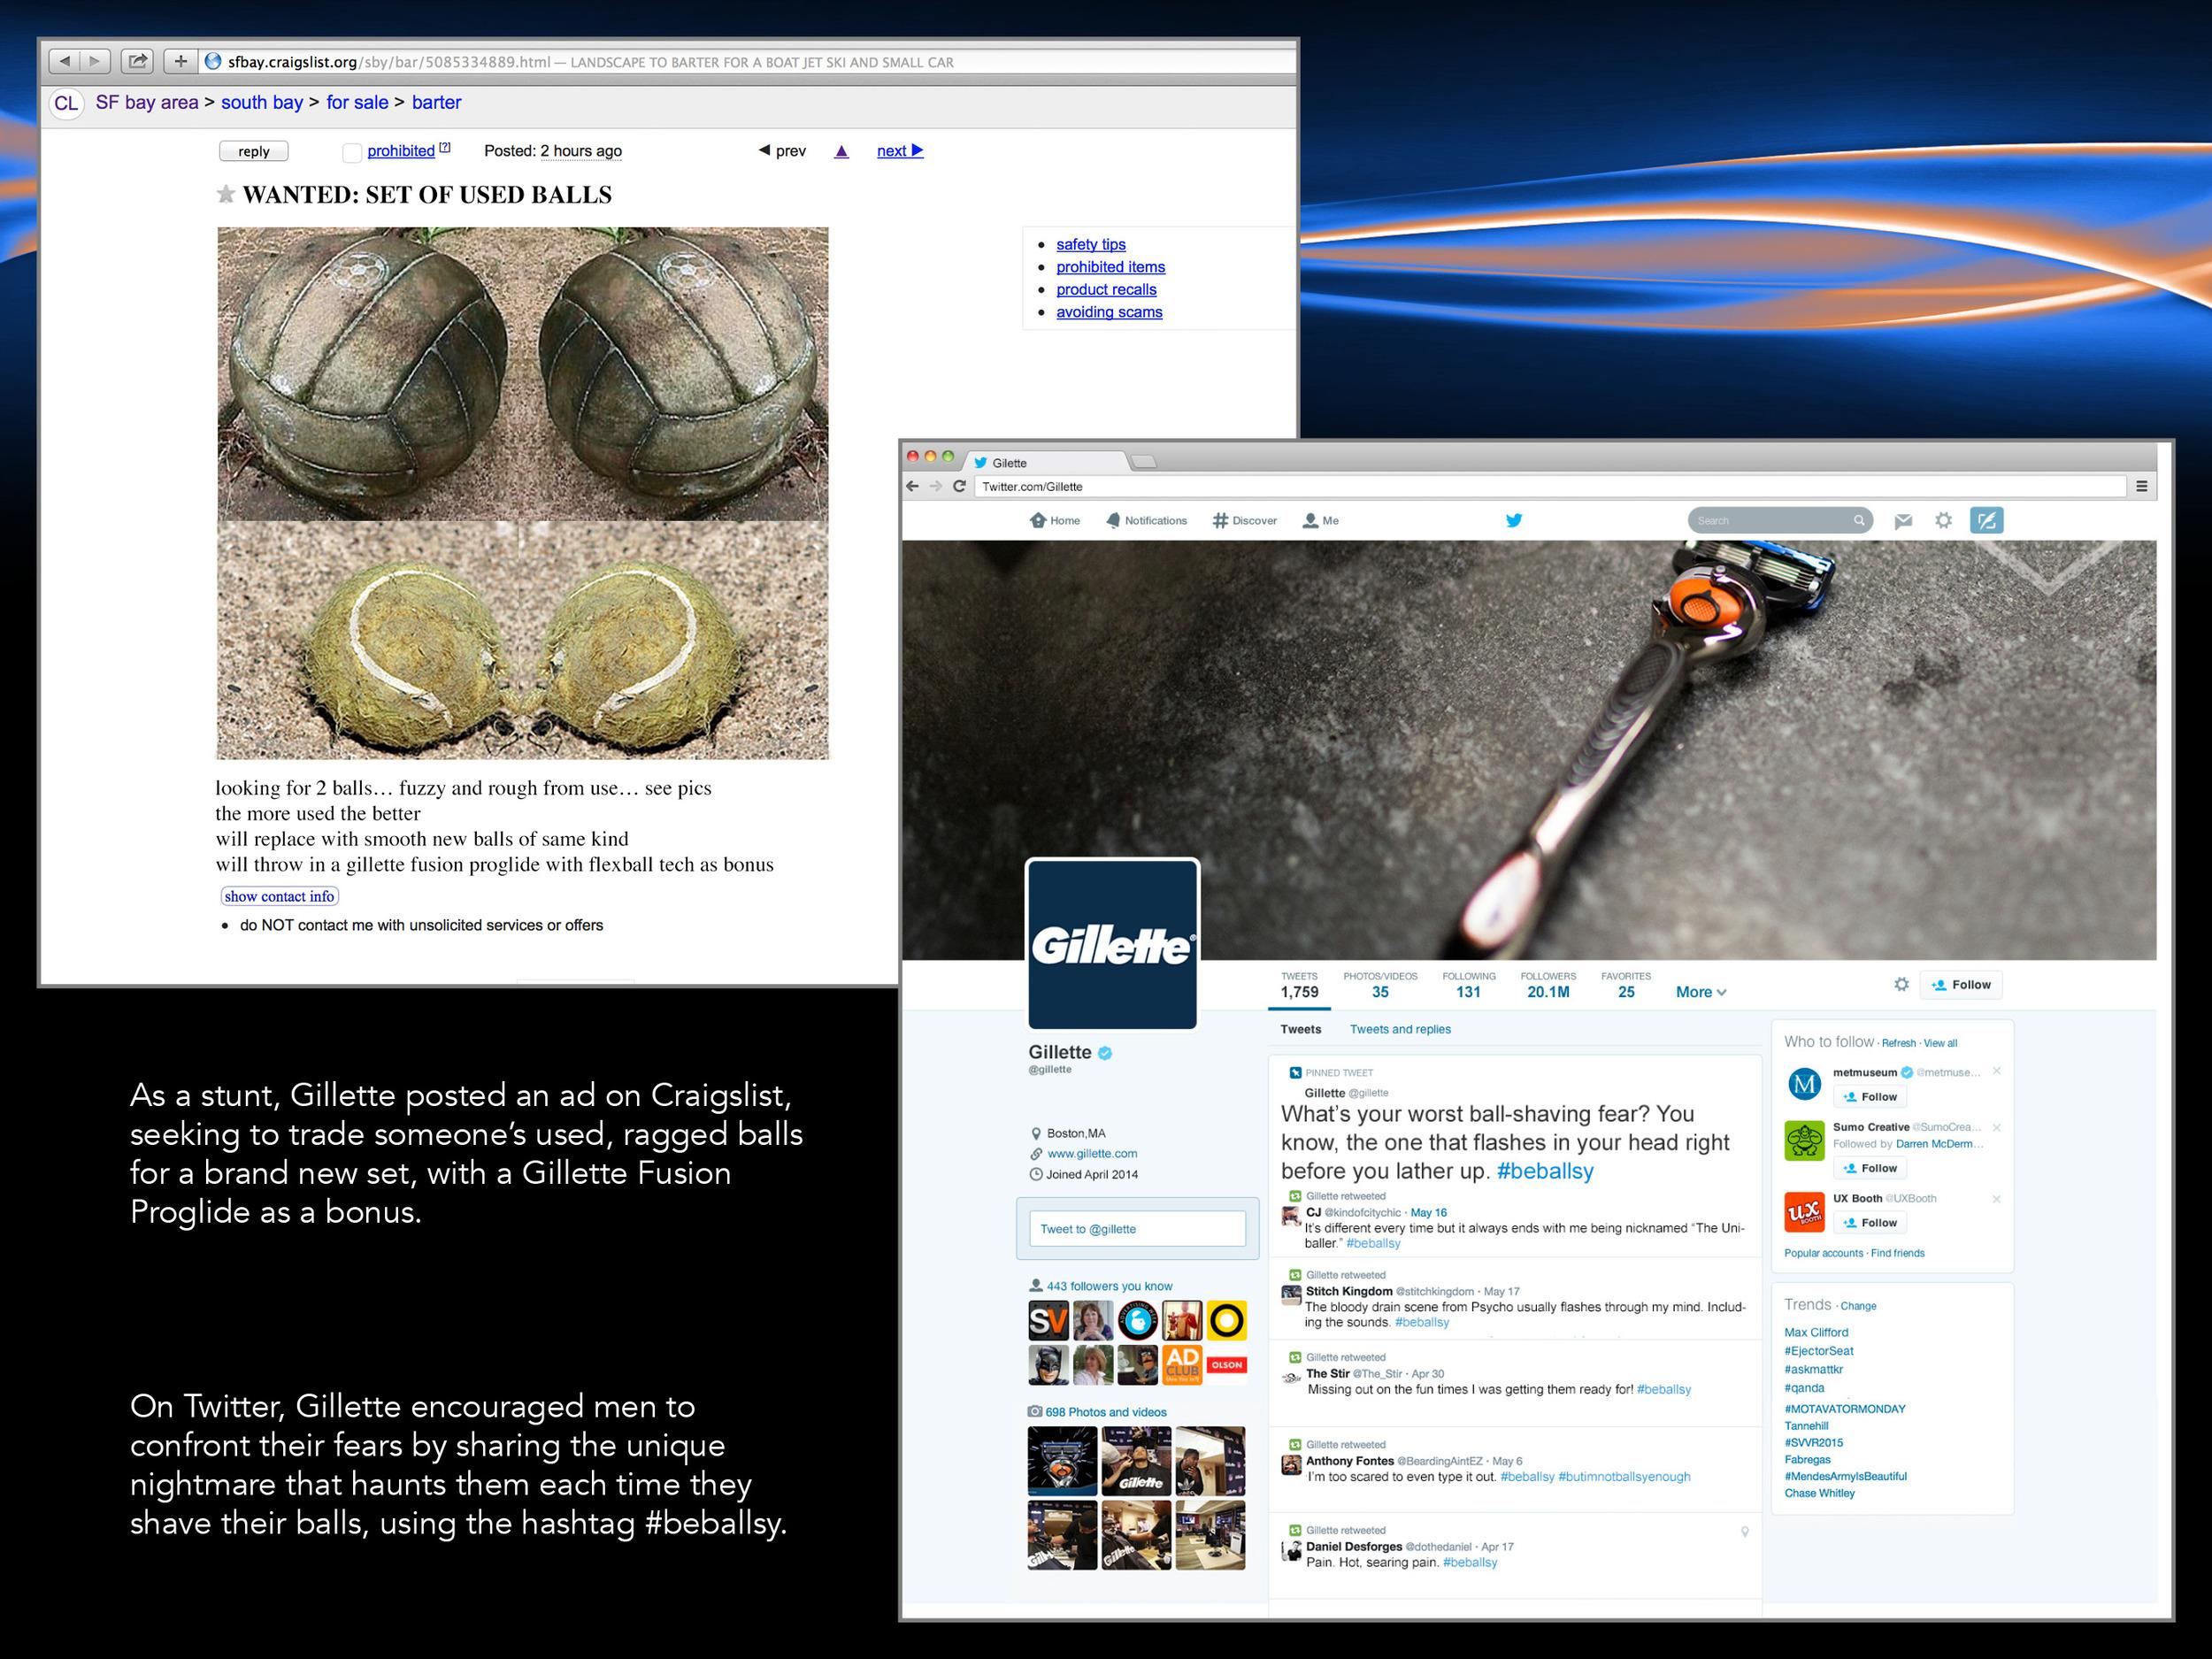 Gillette_boards5.jpg